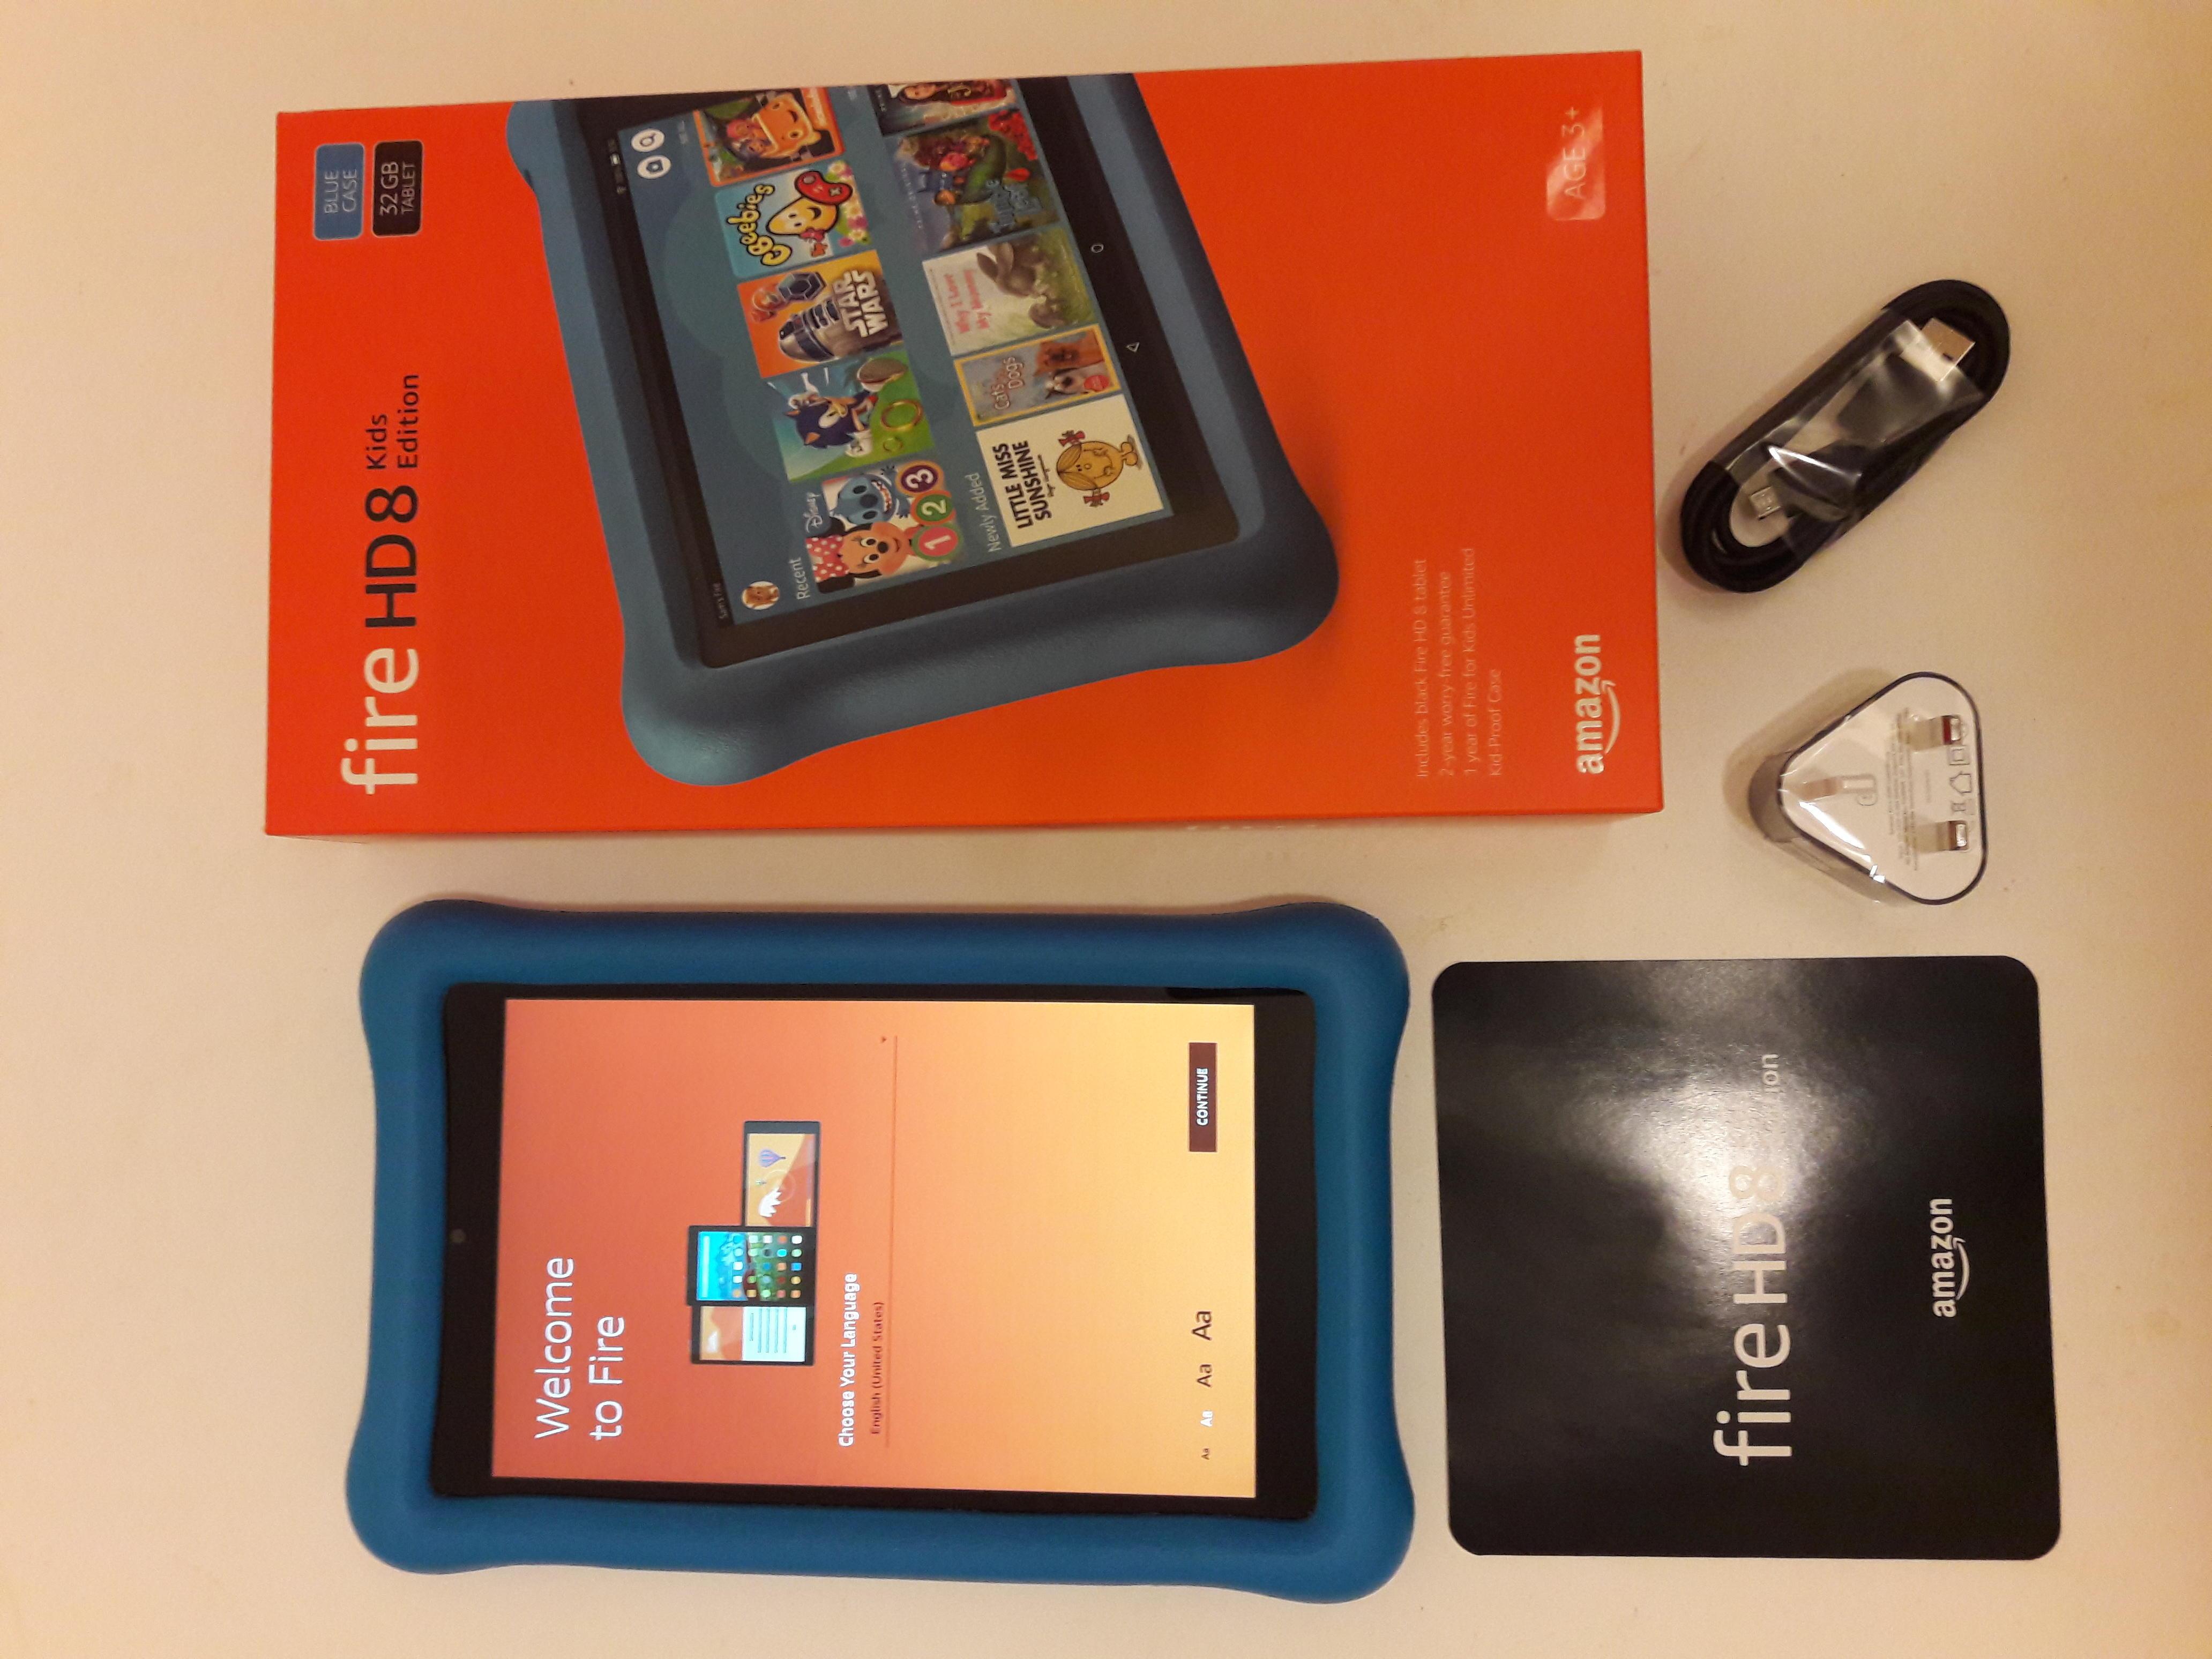 Amazon Fire HD 8 Kids Edition 32GB, Blue Kid-Proof Case